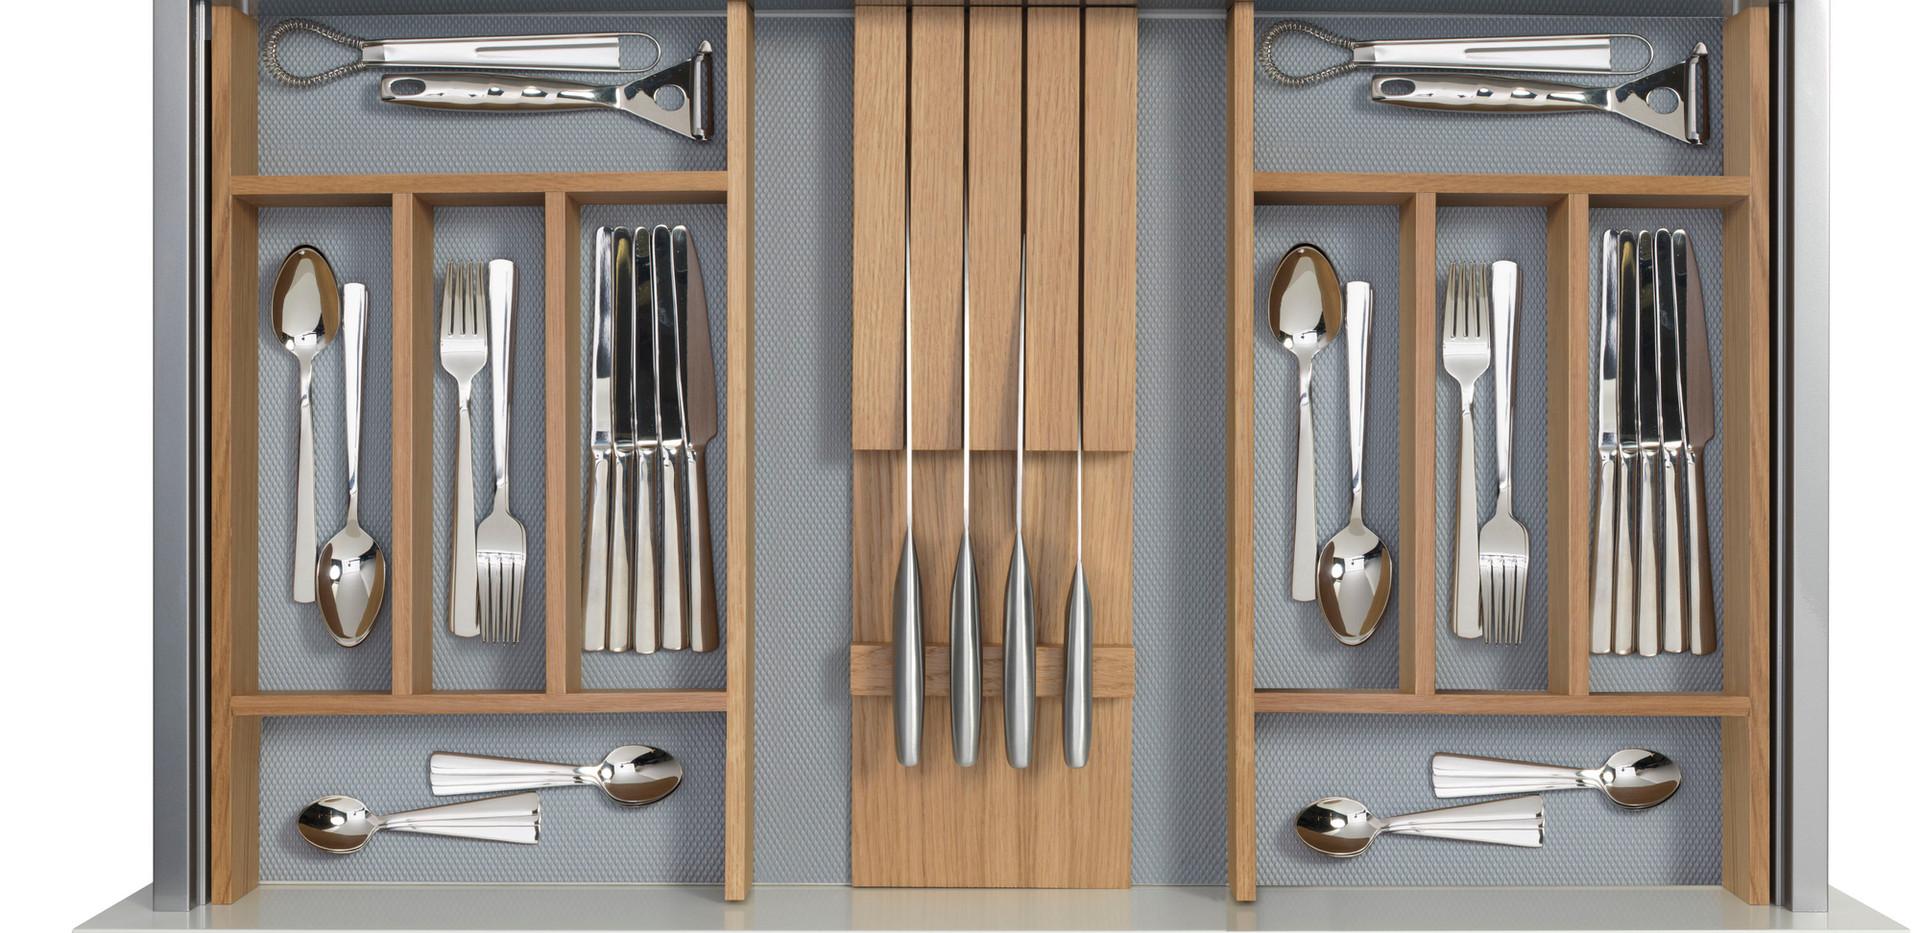 Cutlery Trays Knife Block